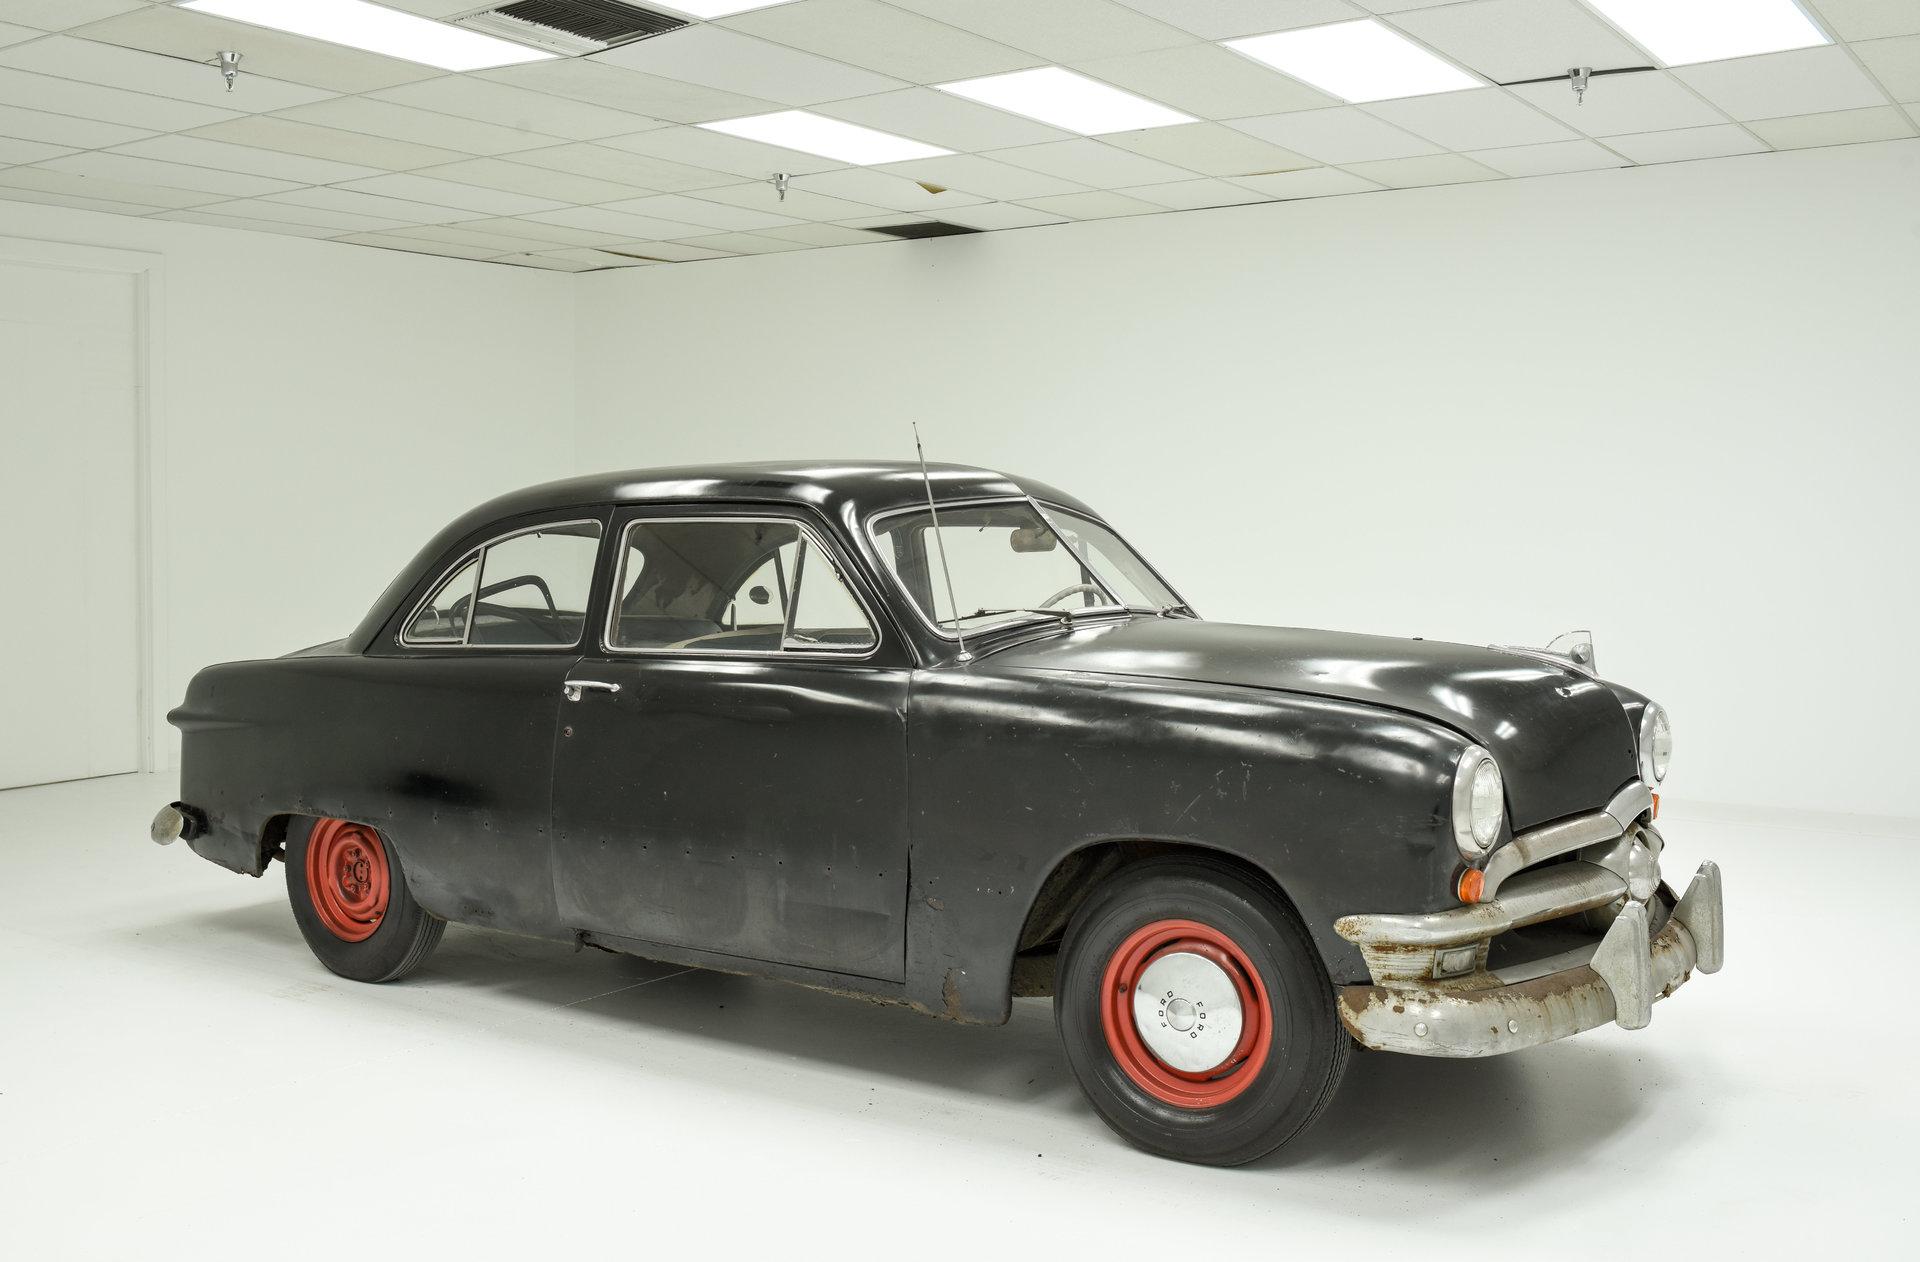 1950 Ford 2 Door Sedan For Sale 79133 Mcg 1949